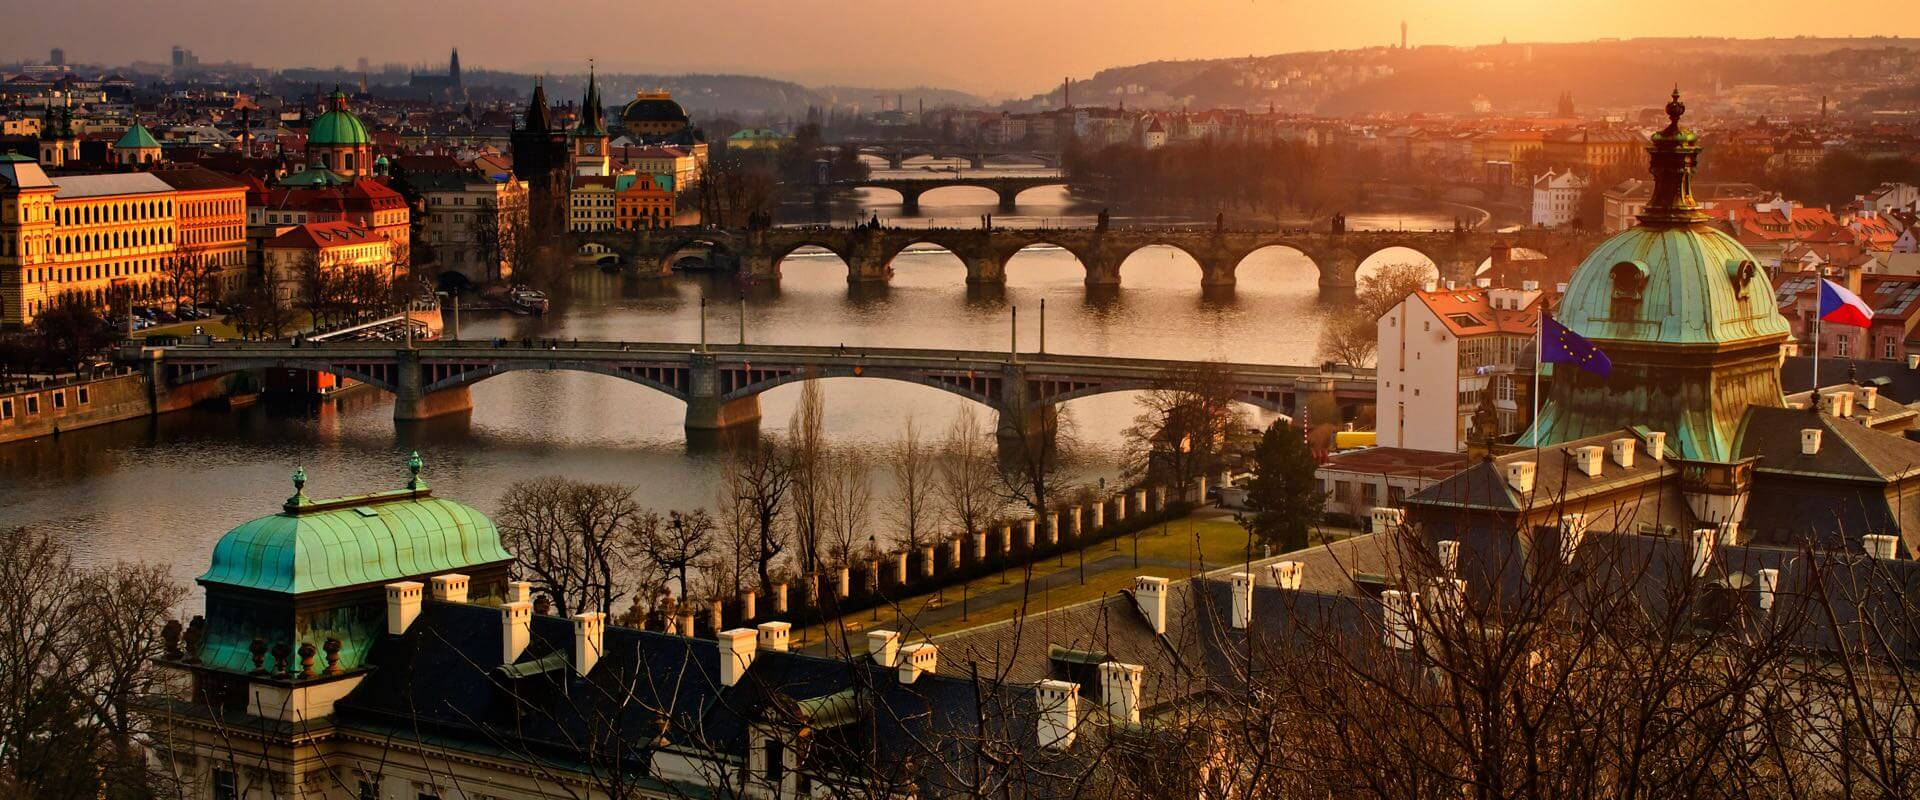 Voli Low Cost Per Praga Repubblica Ceca Da 19 Offerte